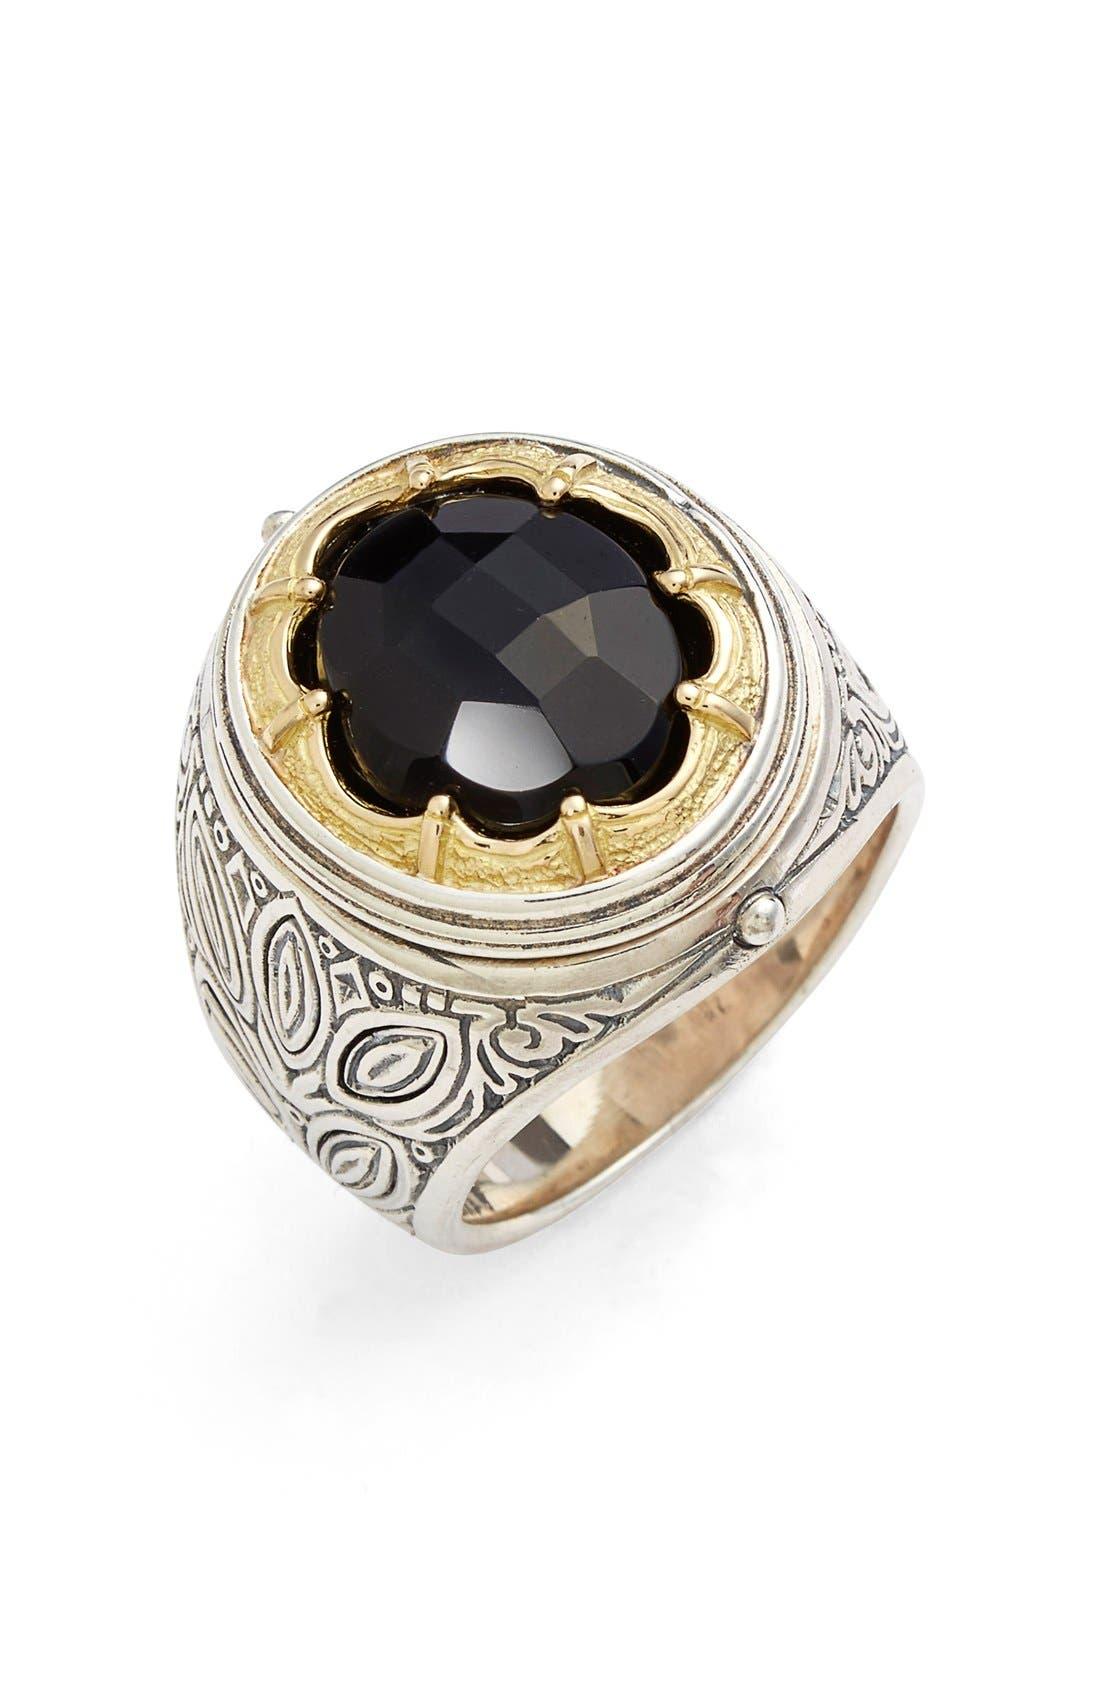 KONSTANTINO 'Orpheus' Petal Set Semiprecious Stone Ring, Main, color, SILVER/ GOLD/ ONYX